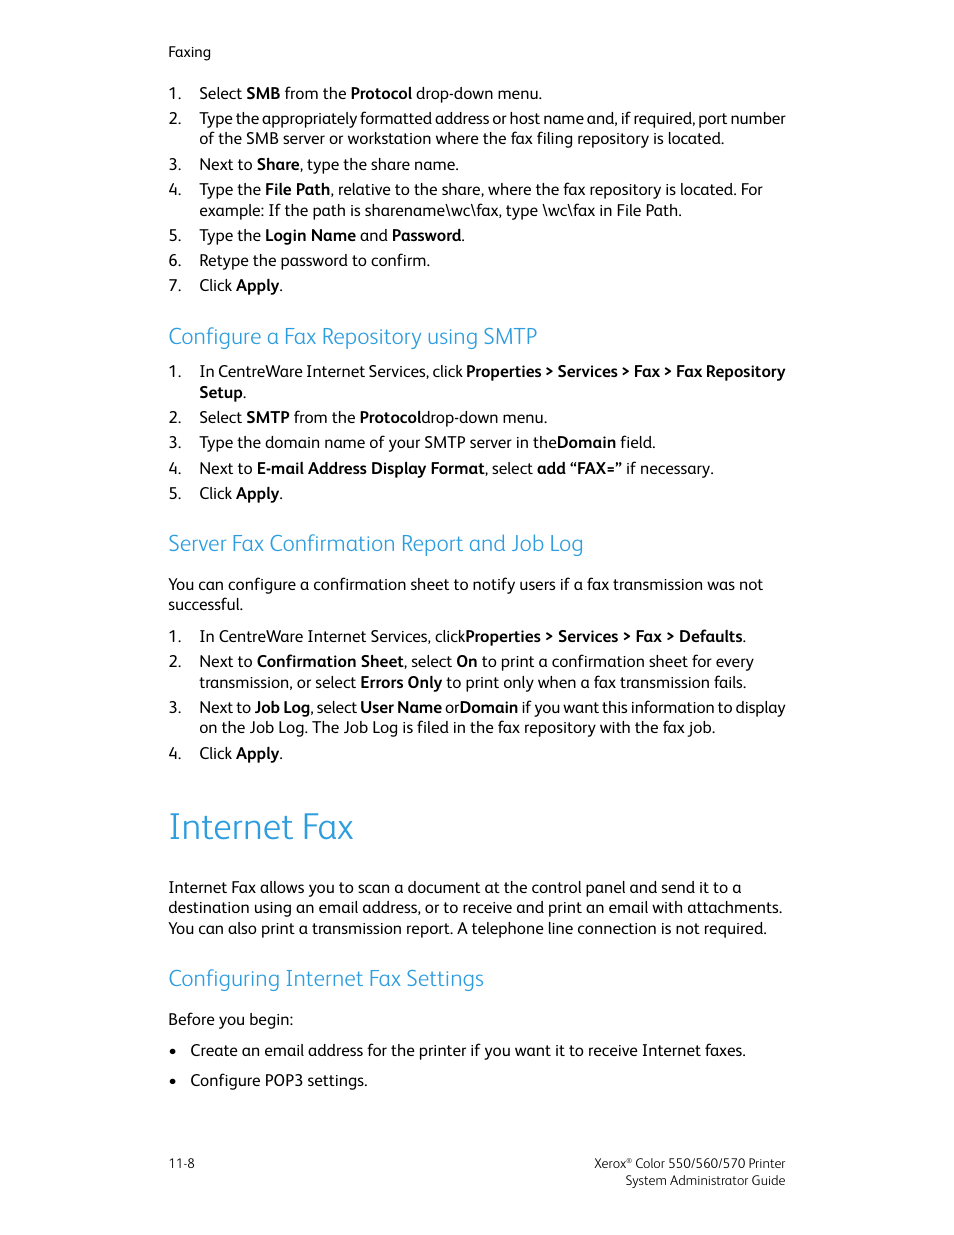 Configure a fax repository using smtp, Server fax confirmation